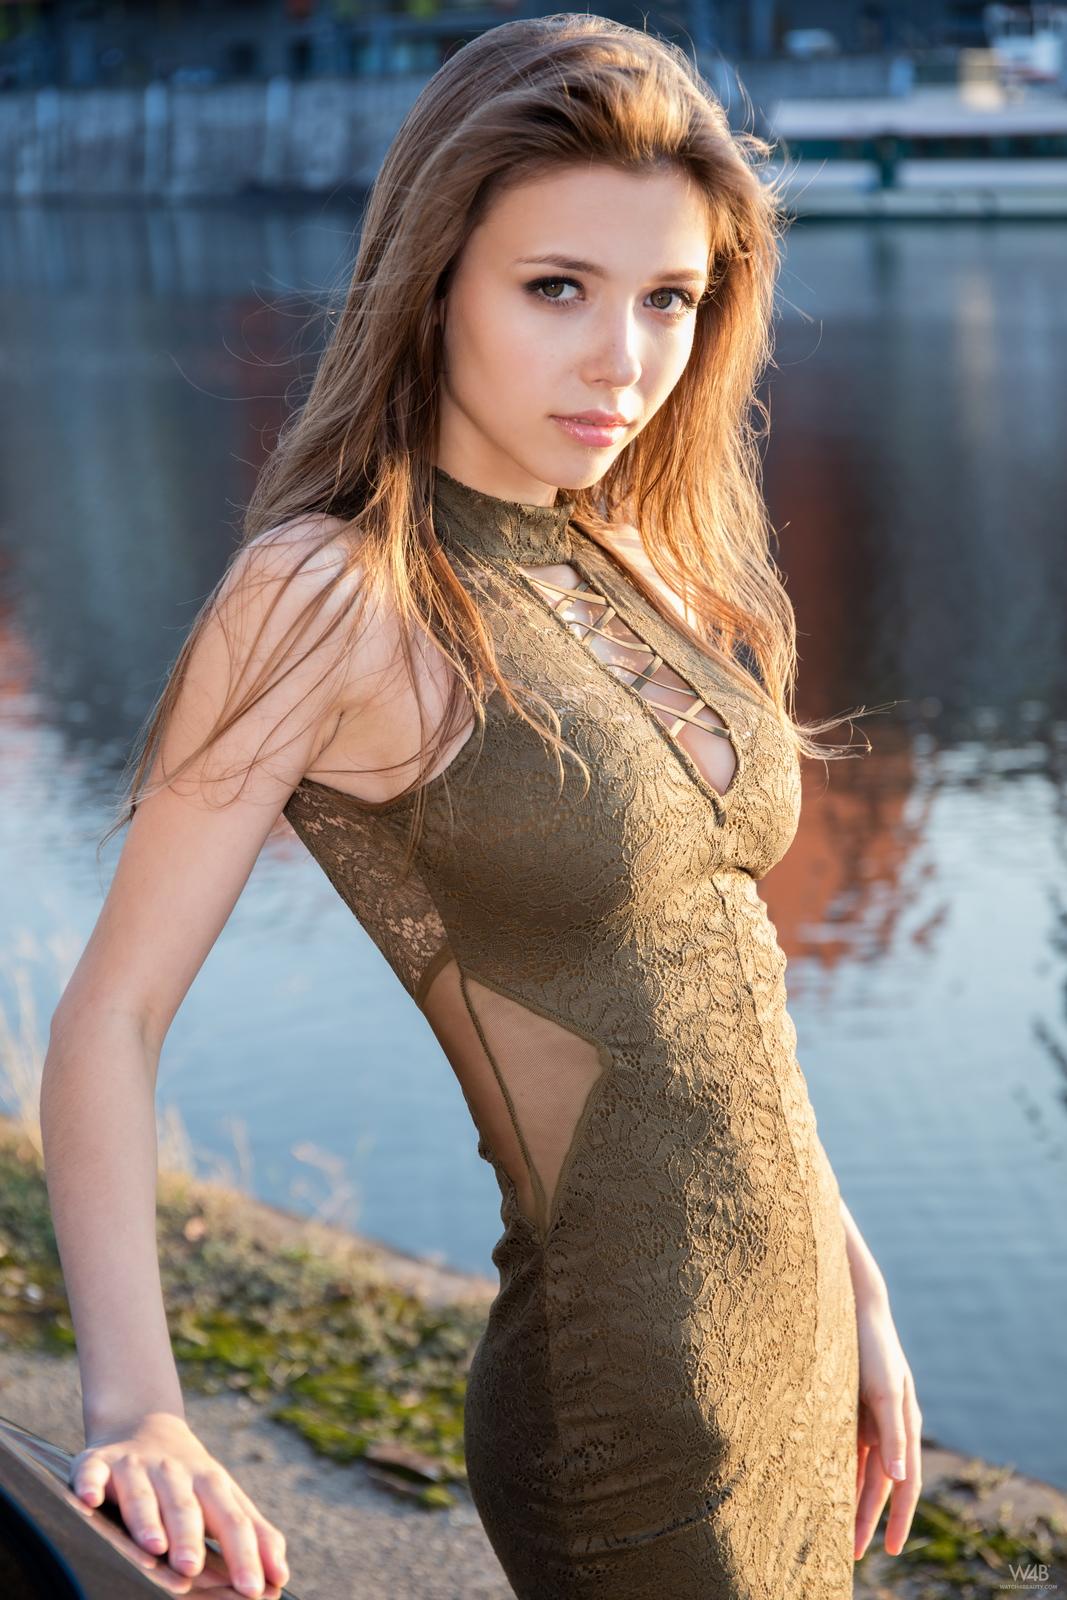 https://redbust.com/stuff/mila-azul-audi-rs5/milla-nude-audi-rs5-cars-pussy-watch4beauty-04.jpg